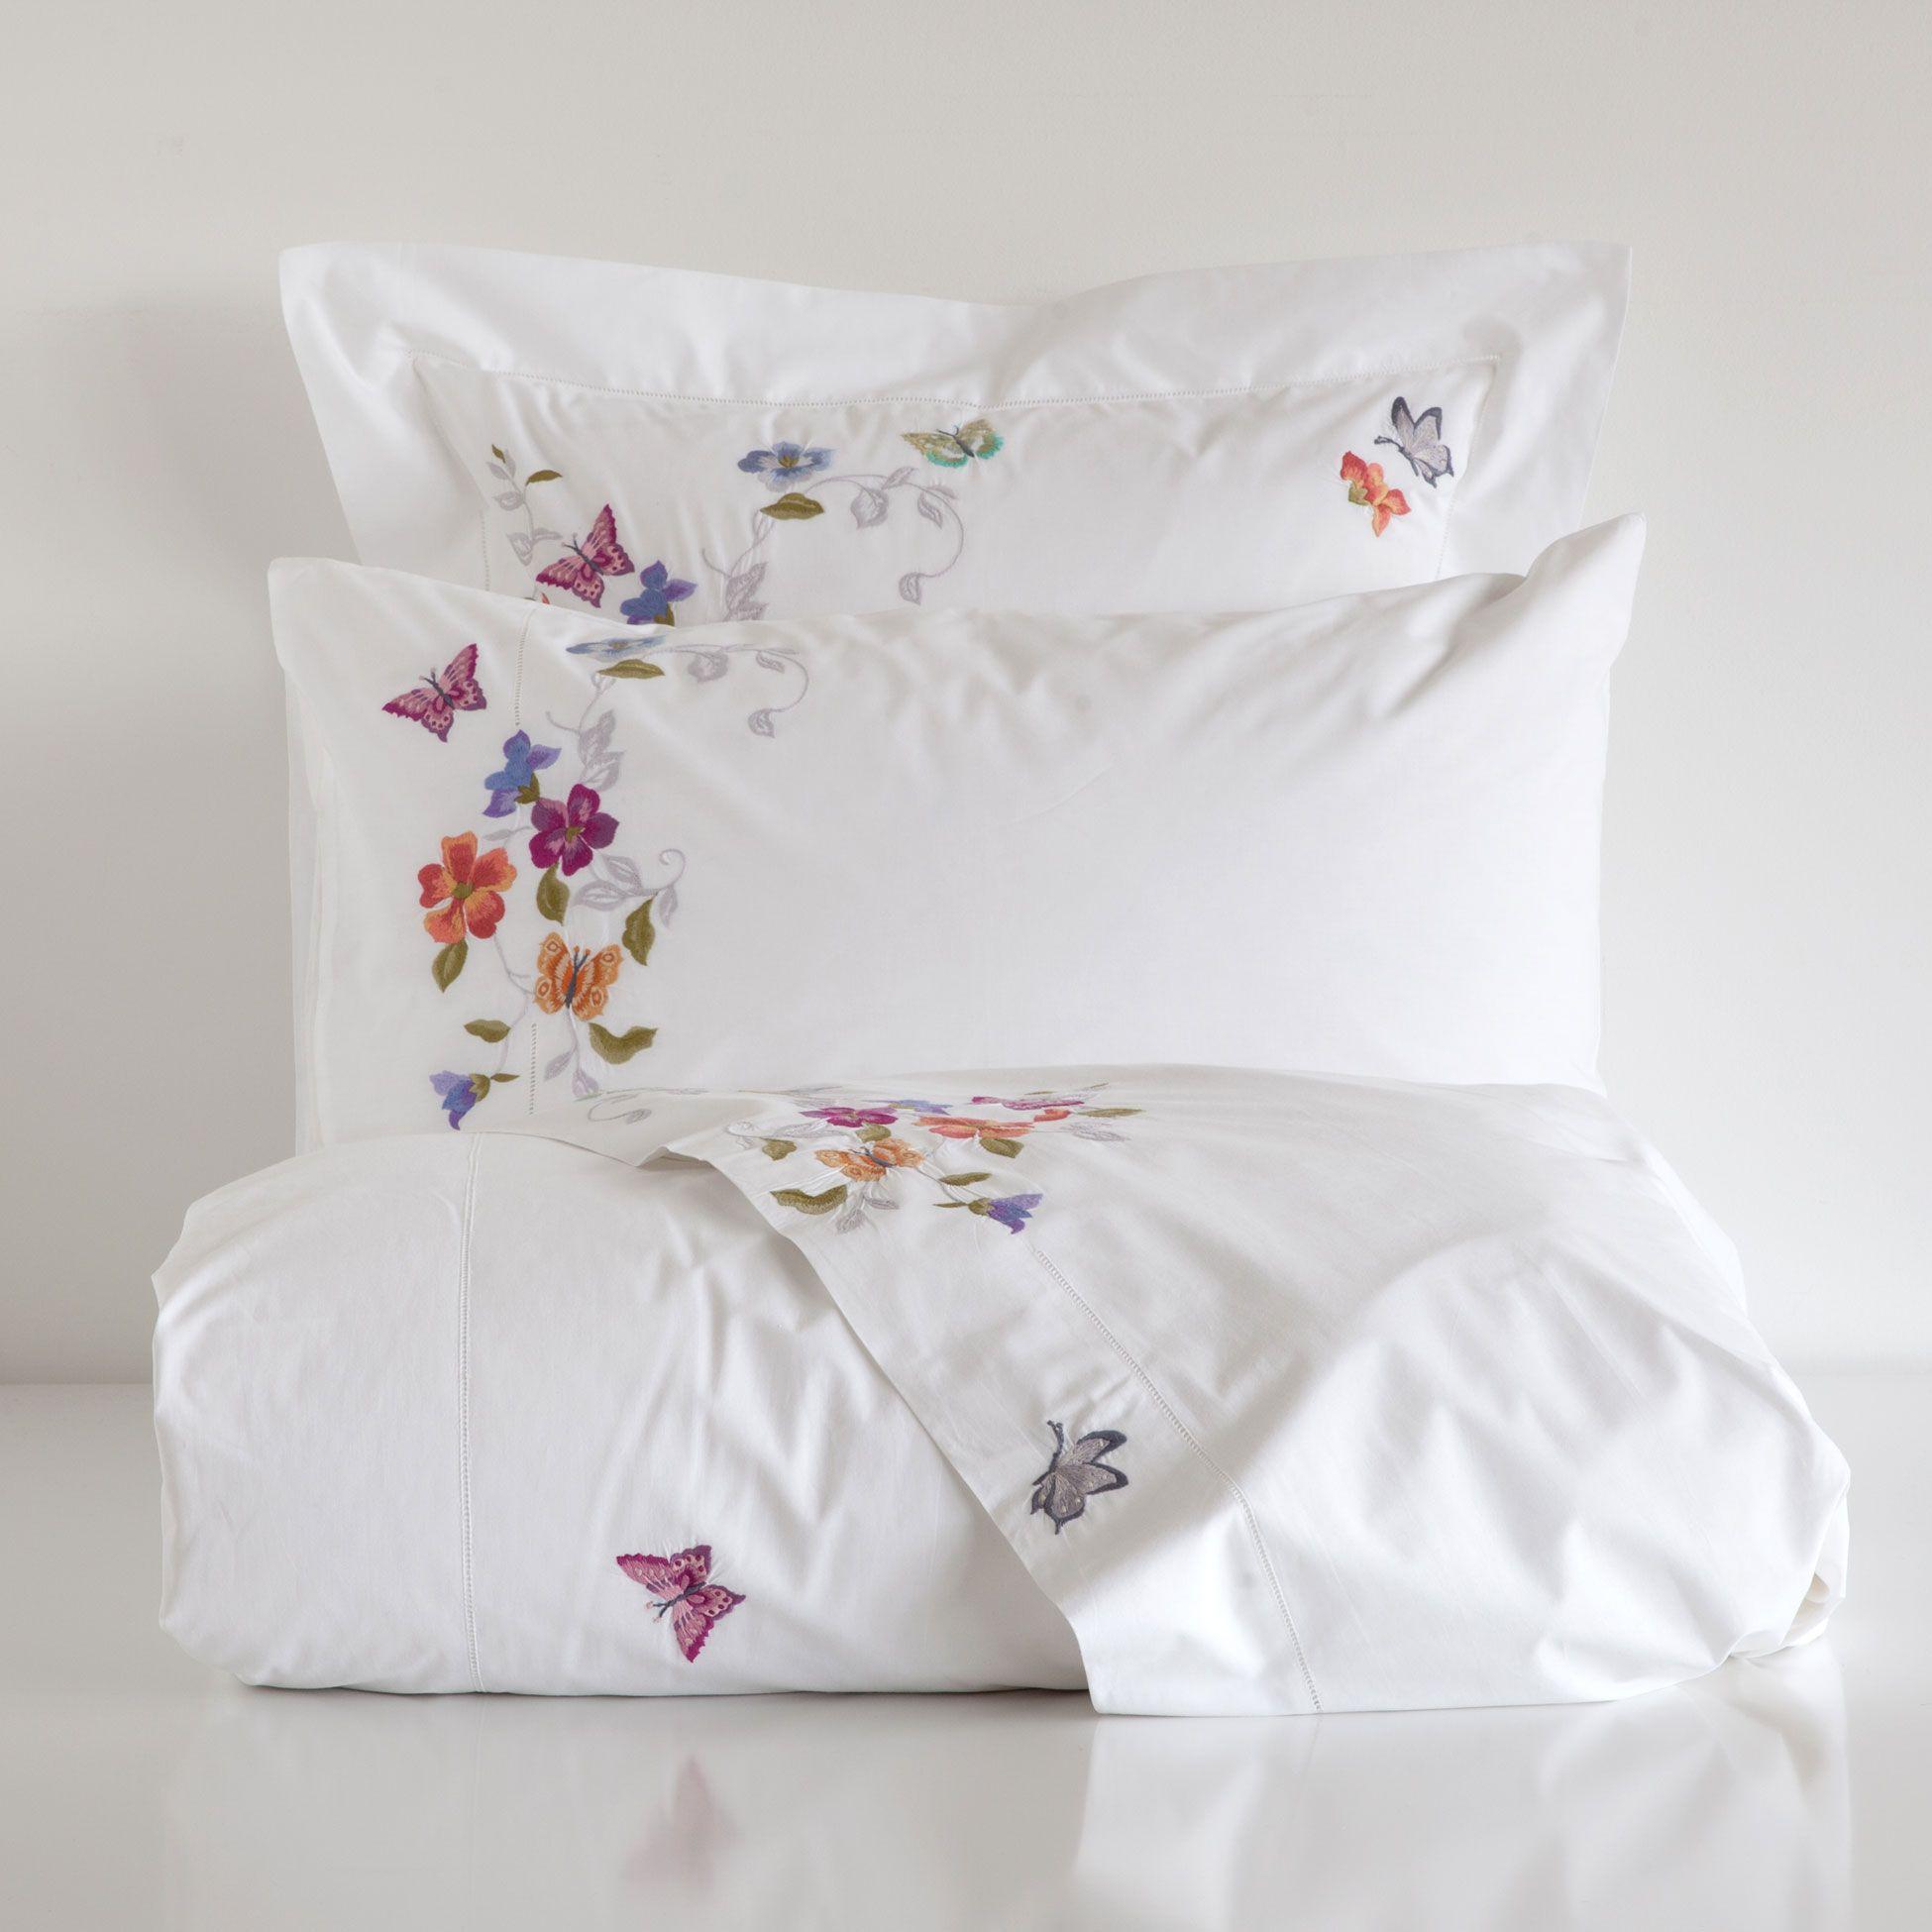 linge de lit percale broderie papillons linge de lit. Black Bedroom Furniture Sets. Home Design Ideas